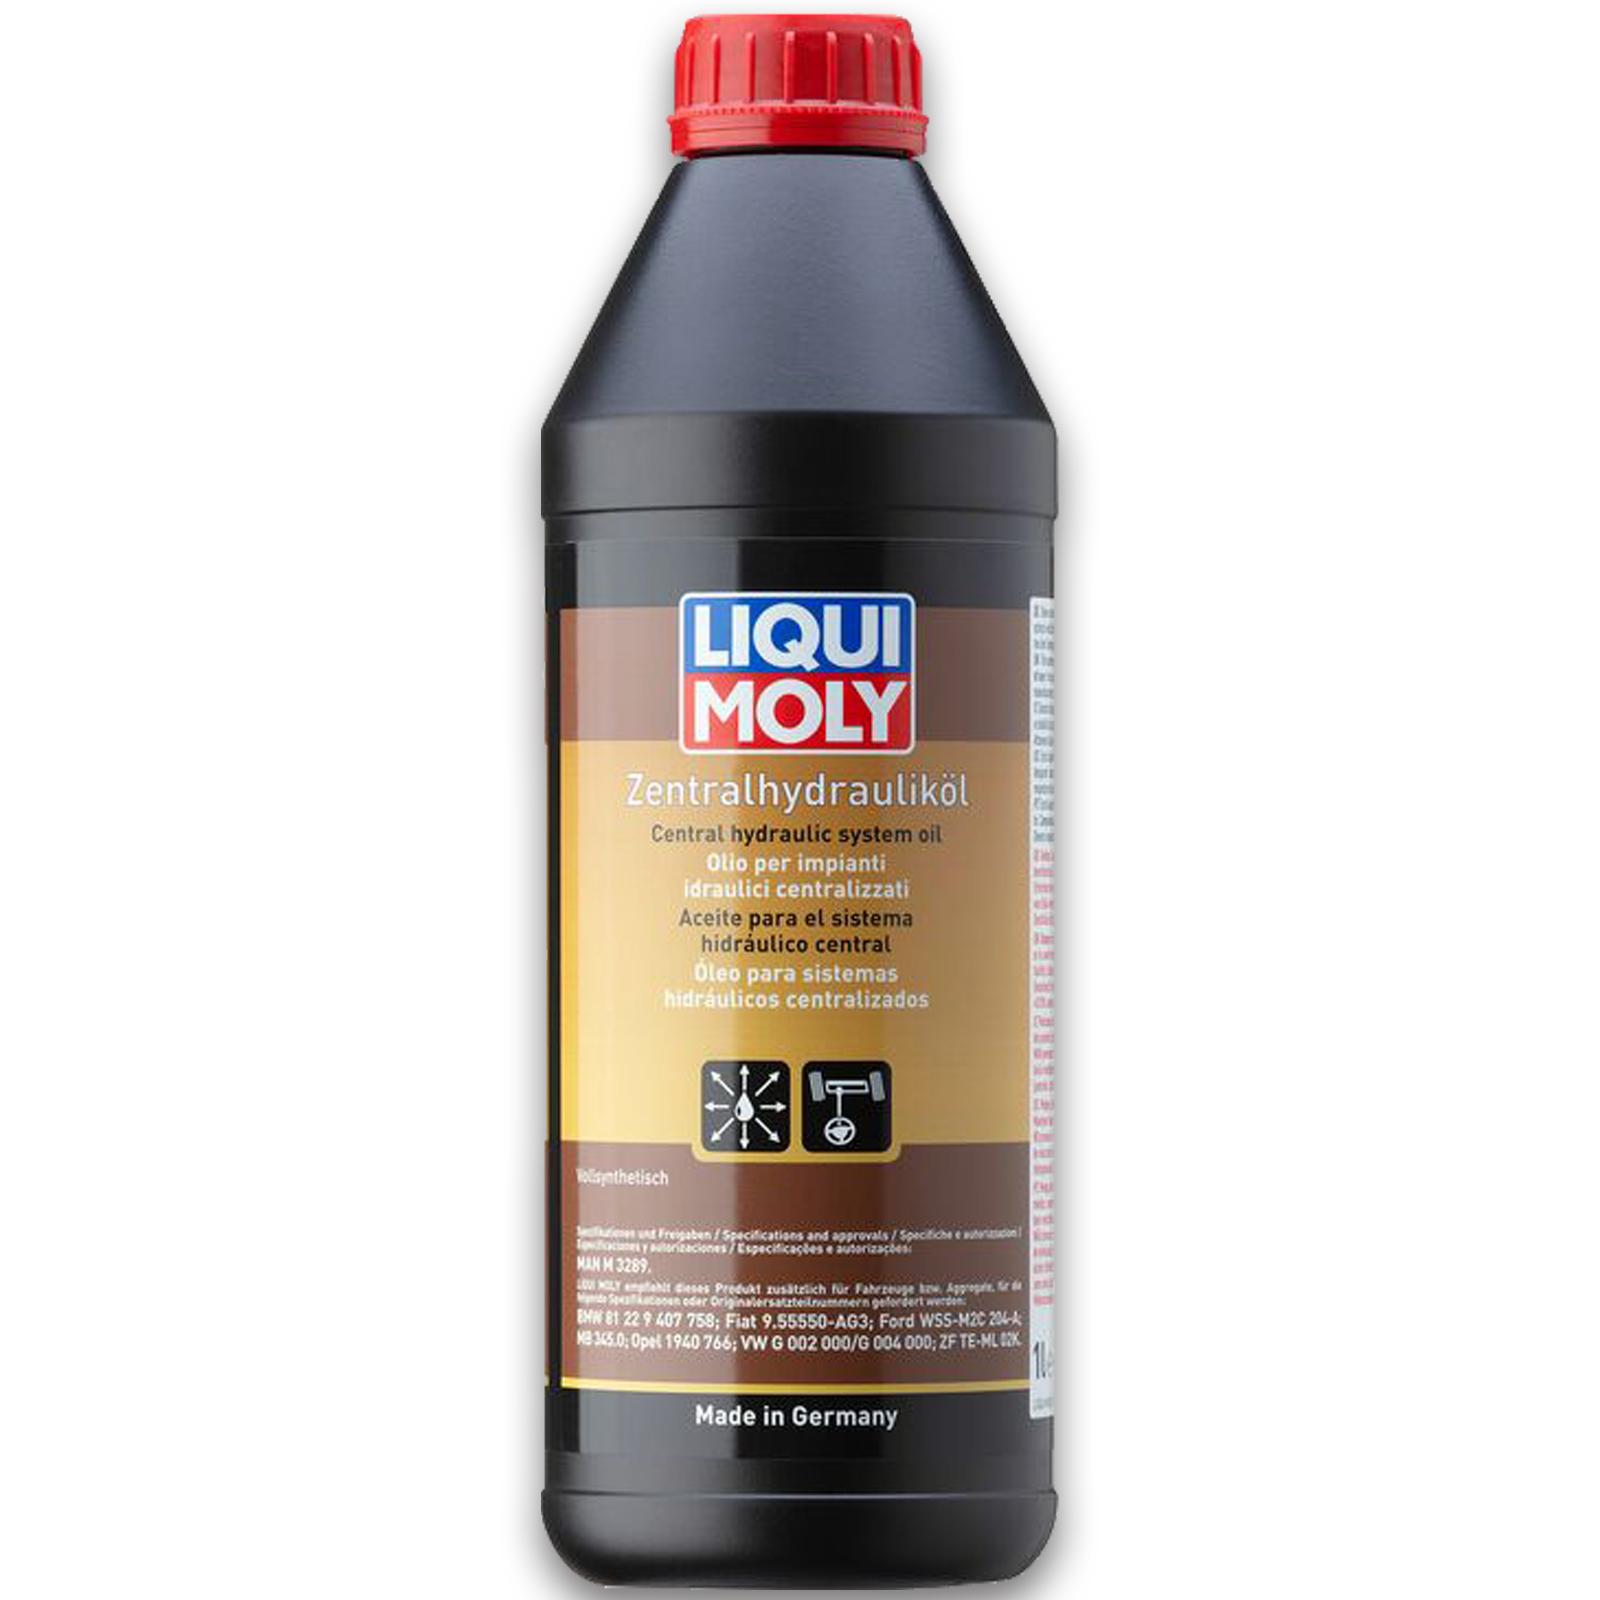 Liqui Moly Zentralhydrauliköl 1L